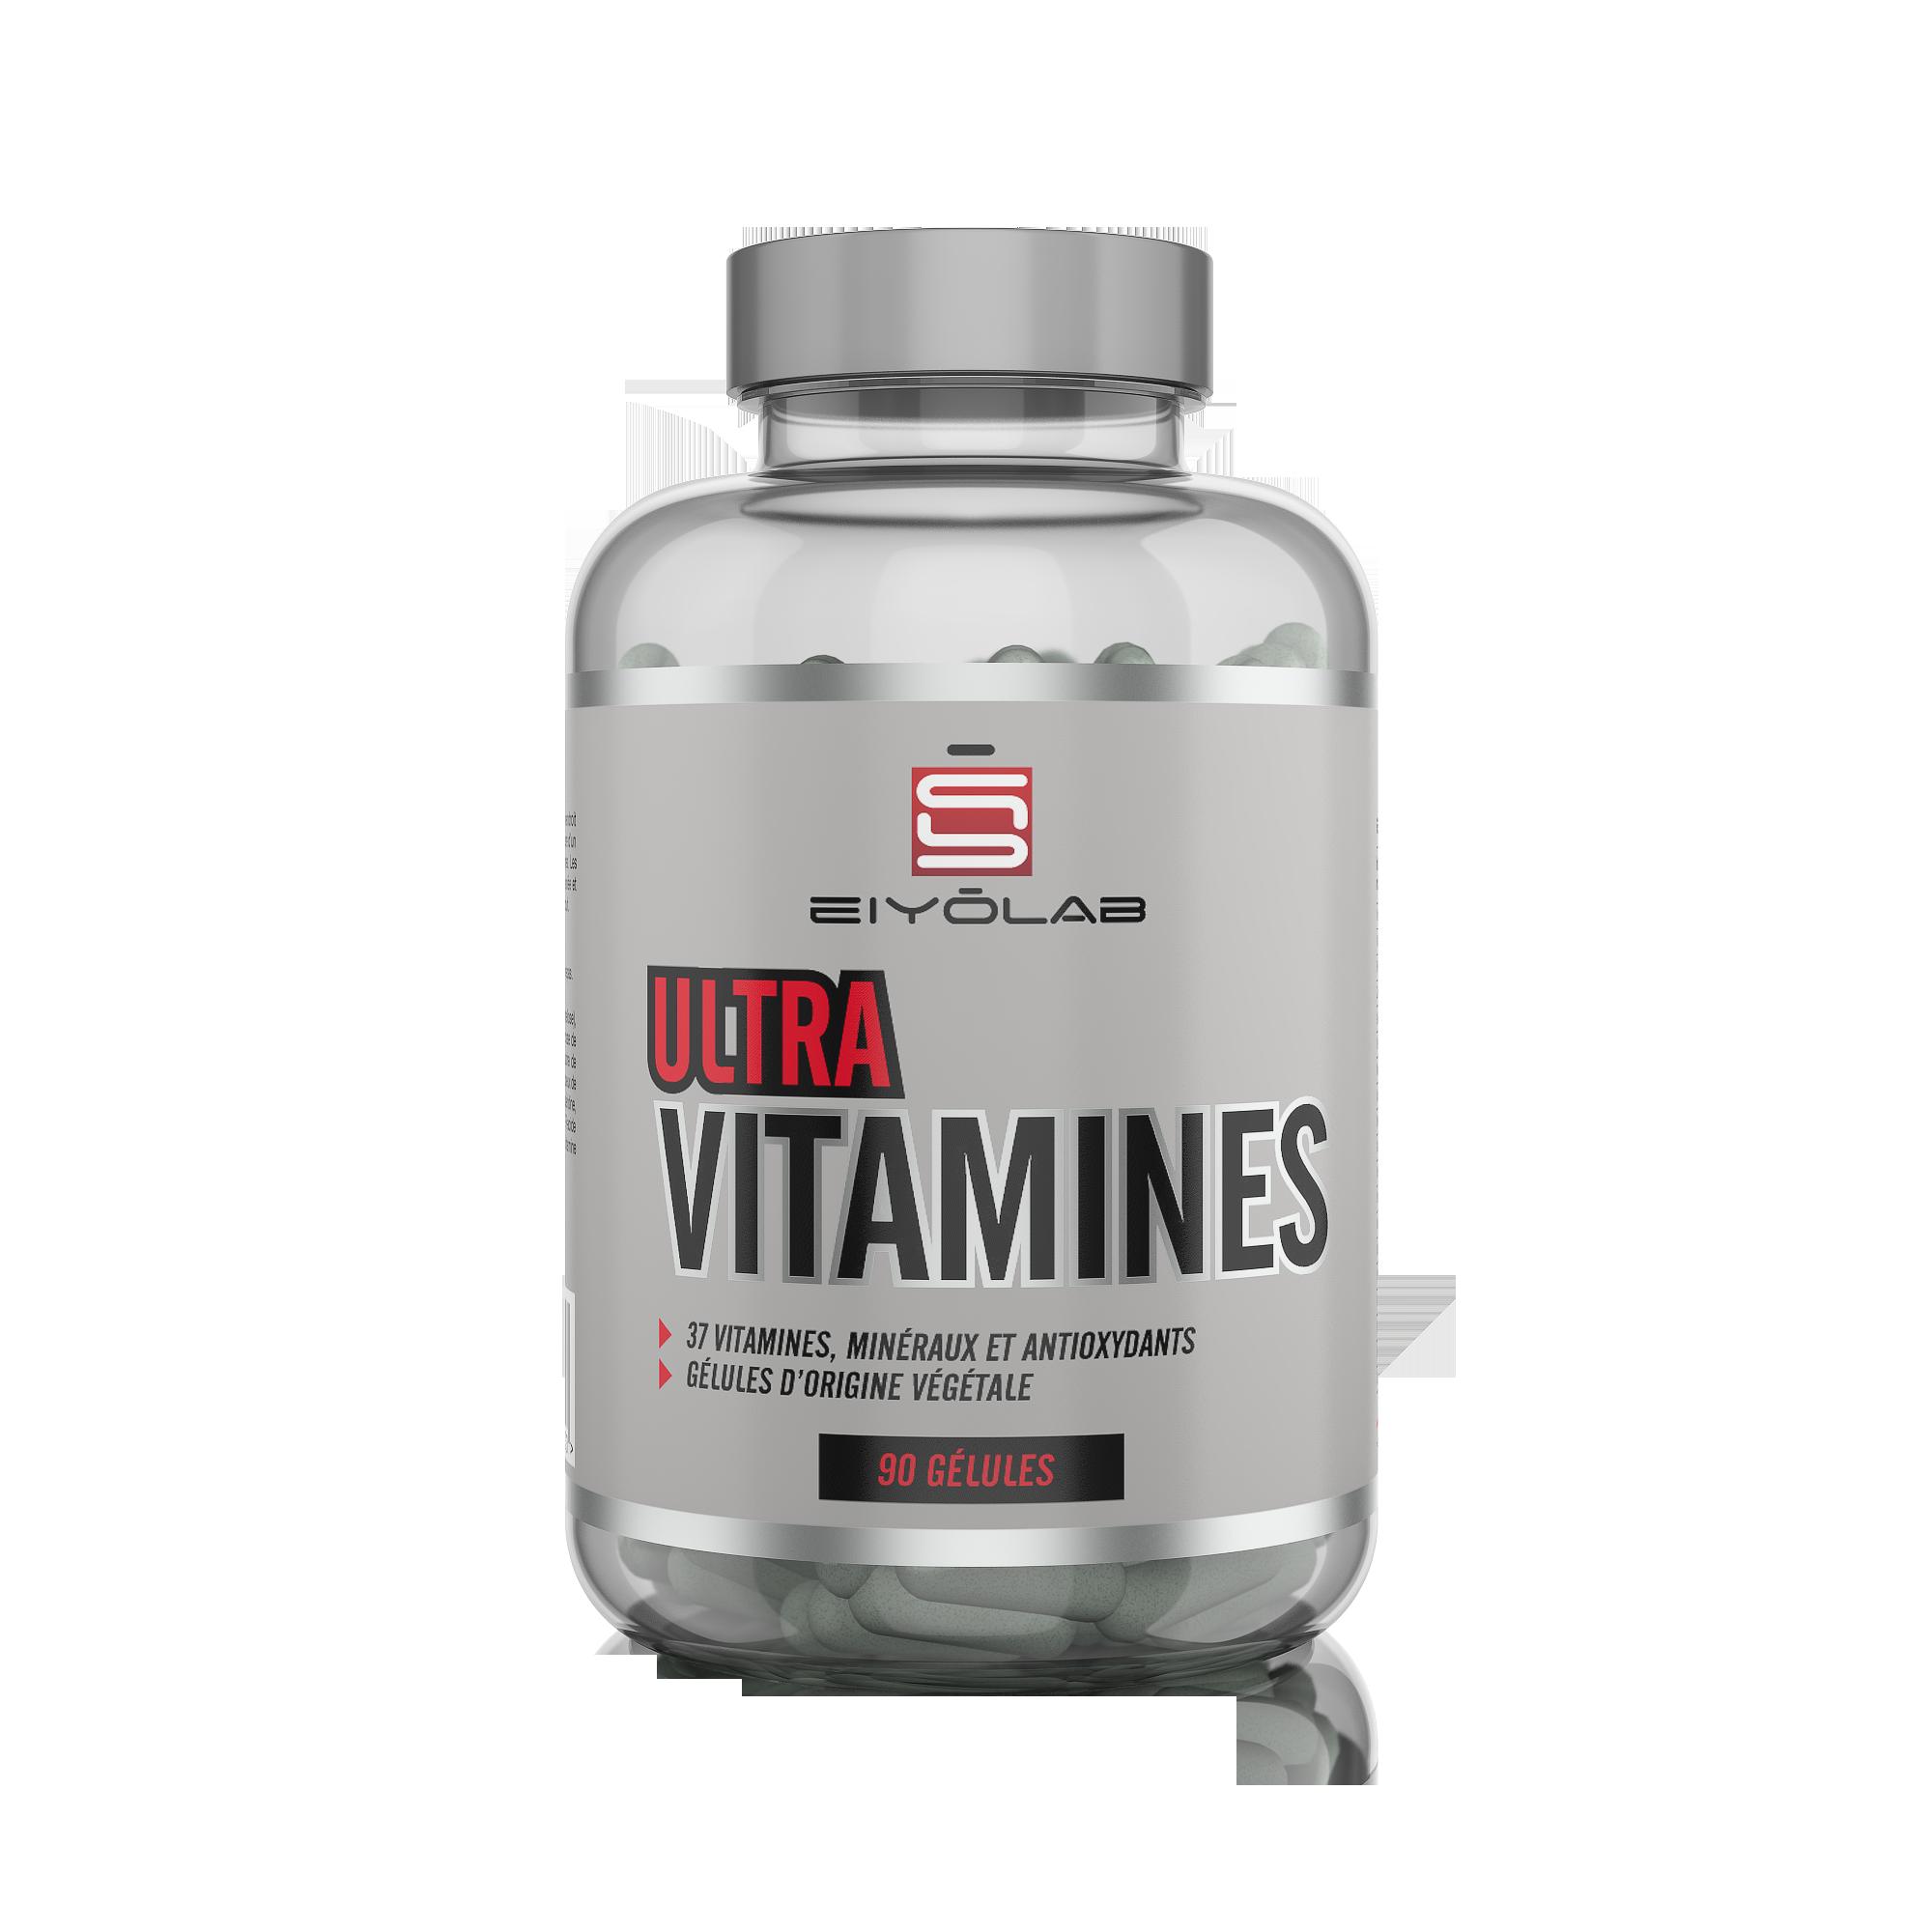 Ultravitamines - Eiyolab - vitamines minéraux | Toutelanutrition